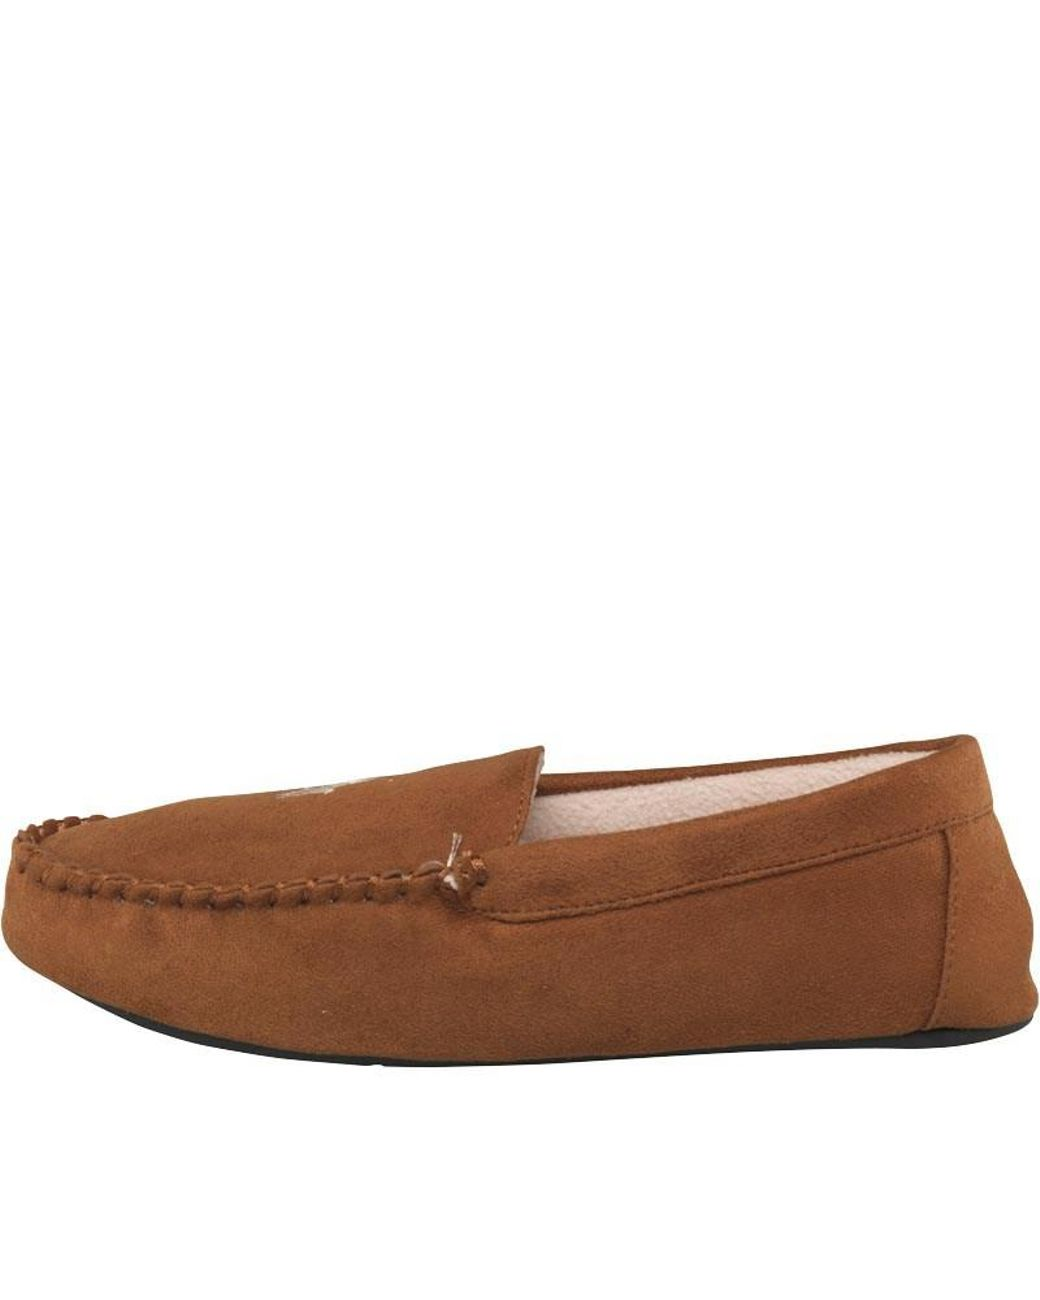 1ae1e5b32 Ralph Lauren Dezi Moccasin Slippers Snuff/khaki in Brown for Men - Lyst